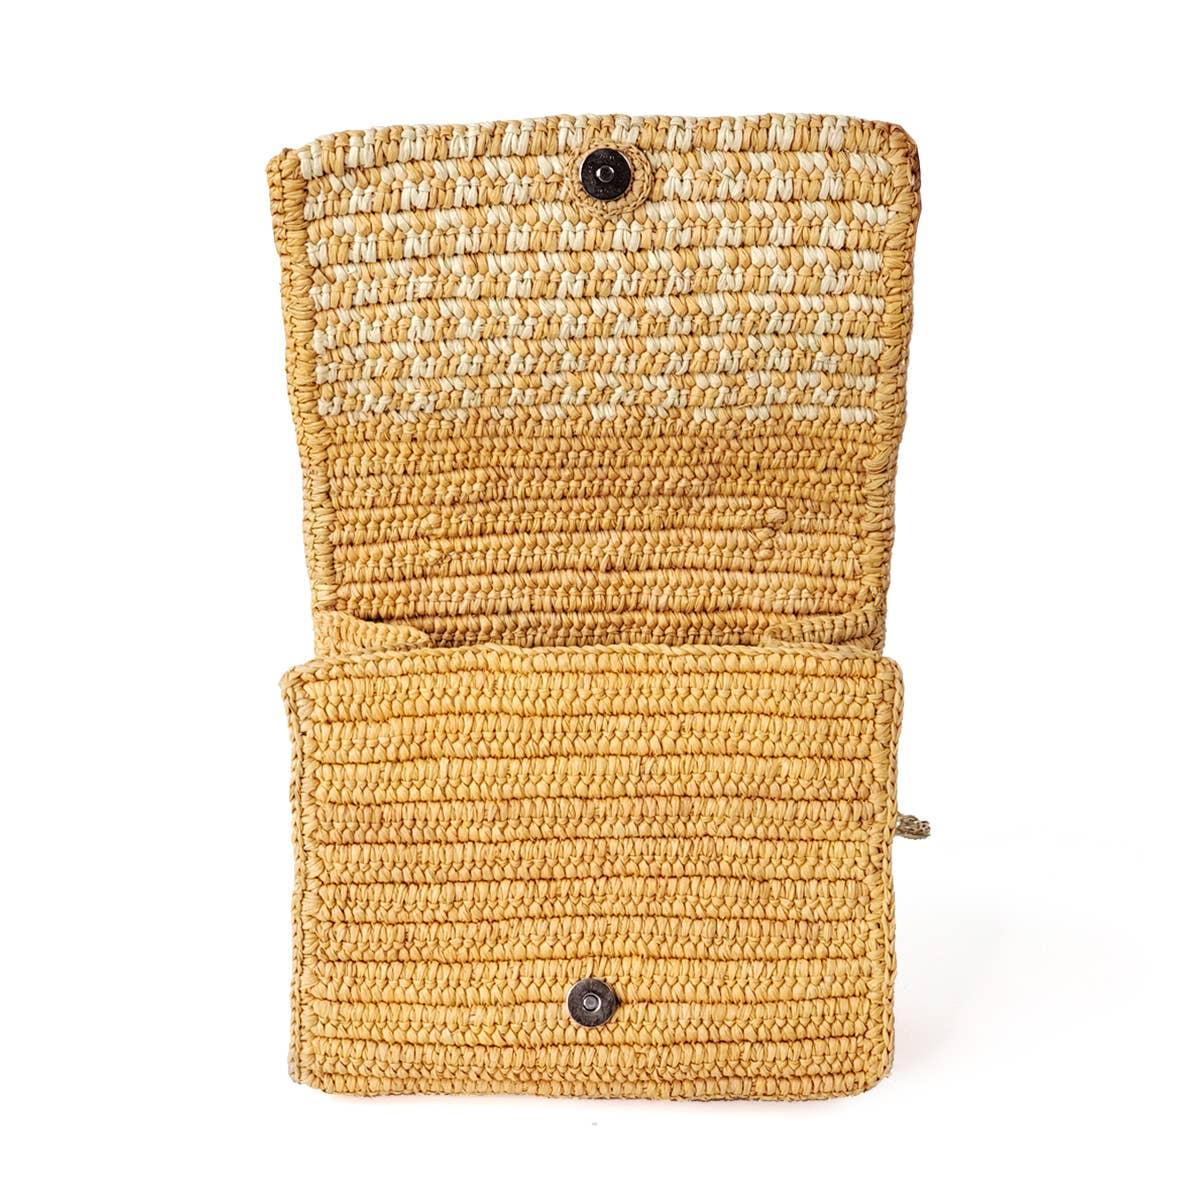 Cillo Crossbody Bag | Trada Marketplace